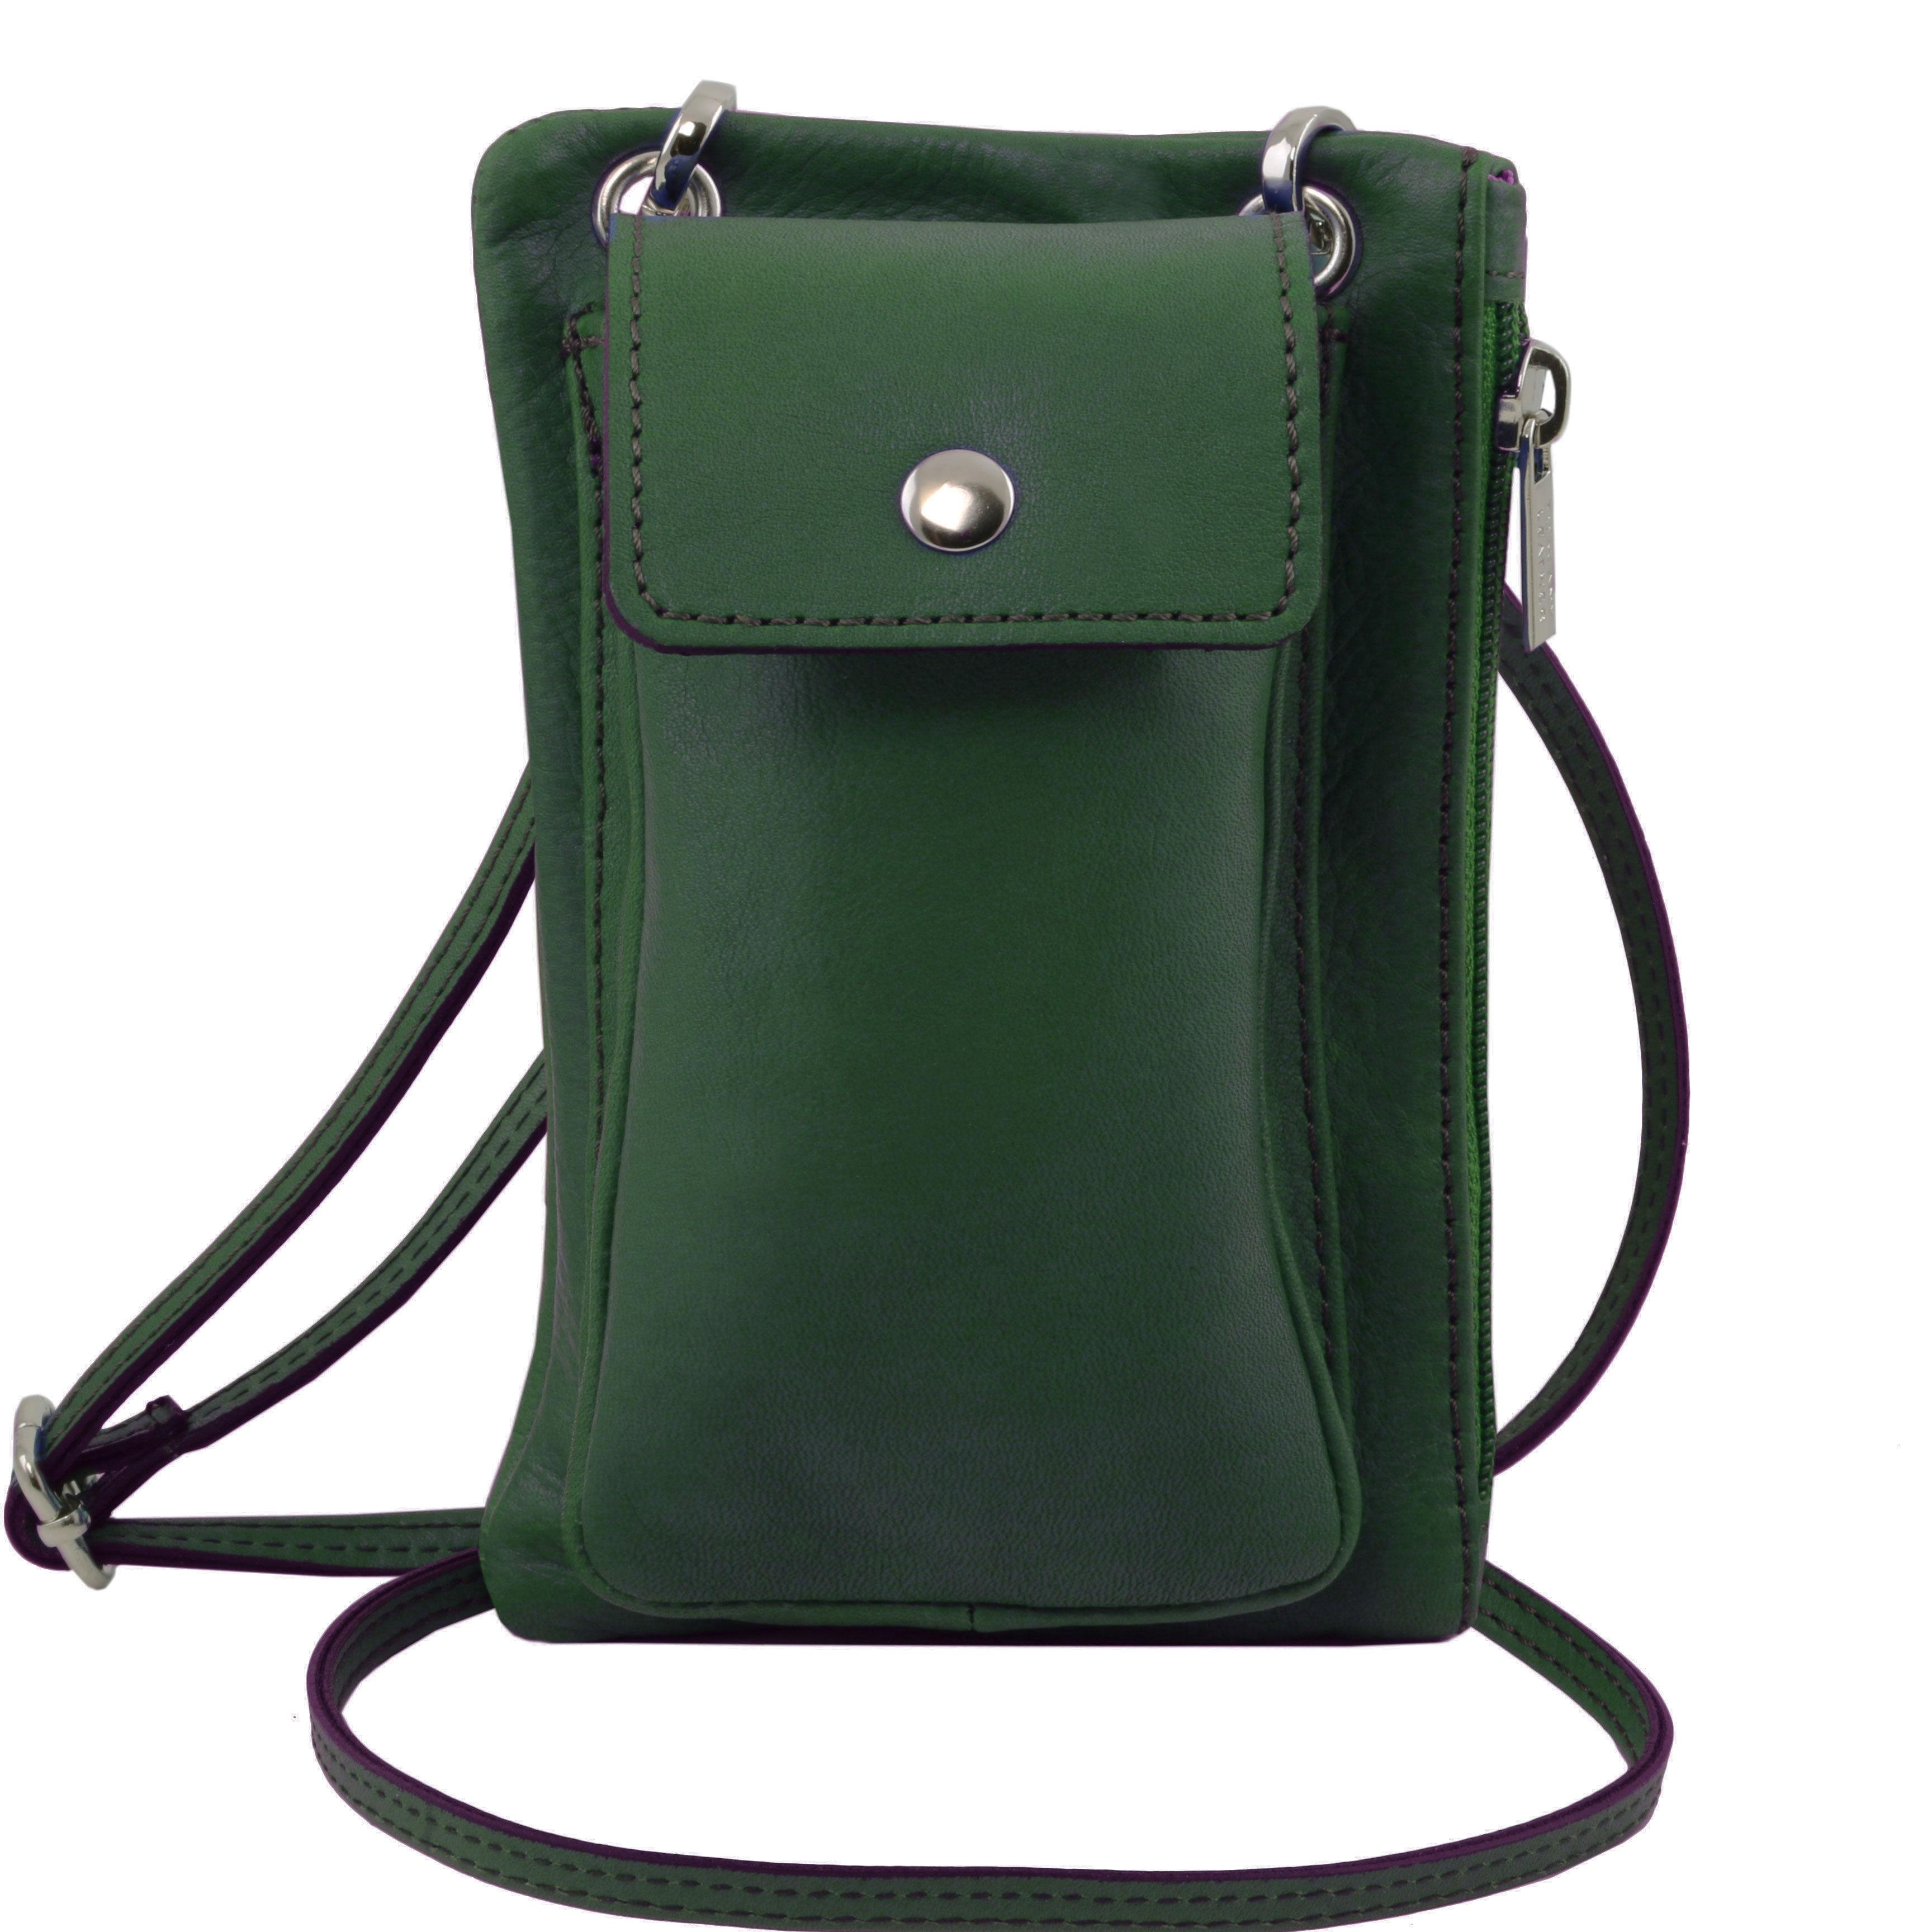 TL Bag - Geanta telefon mini cross din piele verde inchis